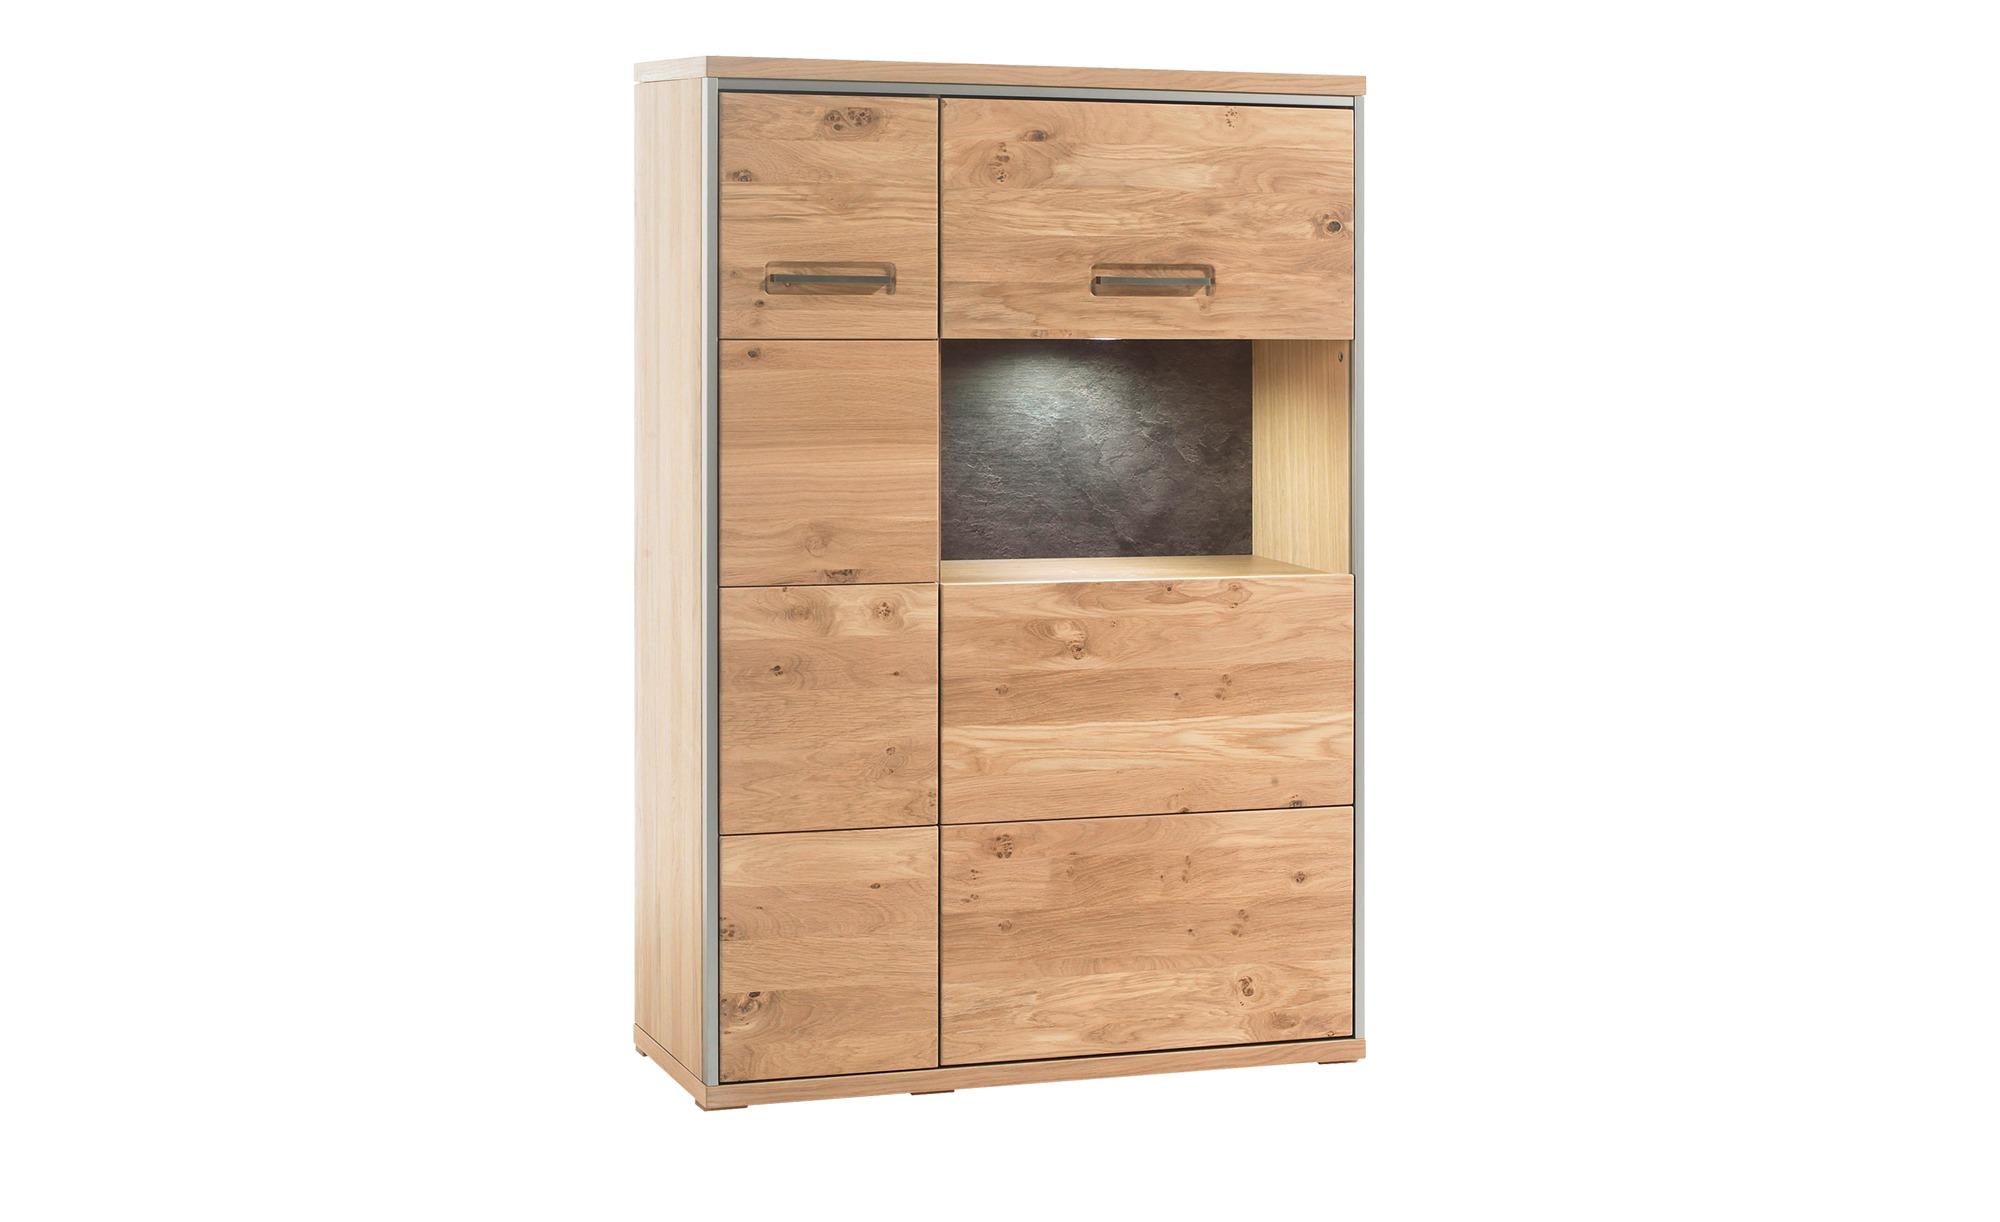 woodford kombi highboard duo breite 94 cm h he 136 cm online kaufen bei woonio. Black Bedroom Furniture Sets. Home Design Ideas